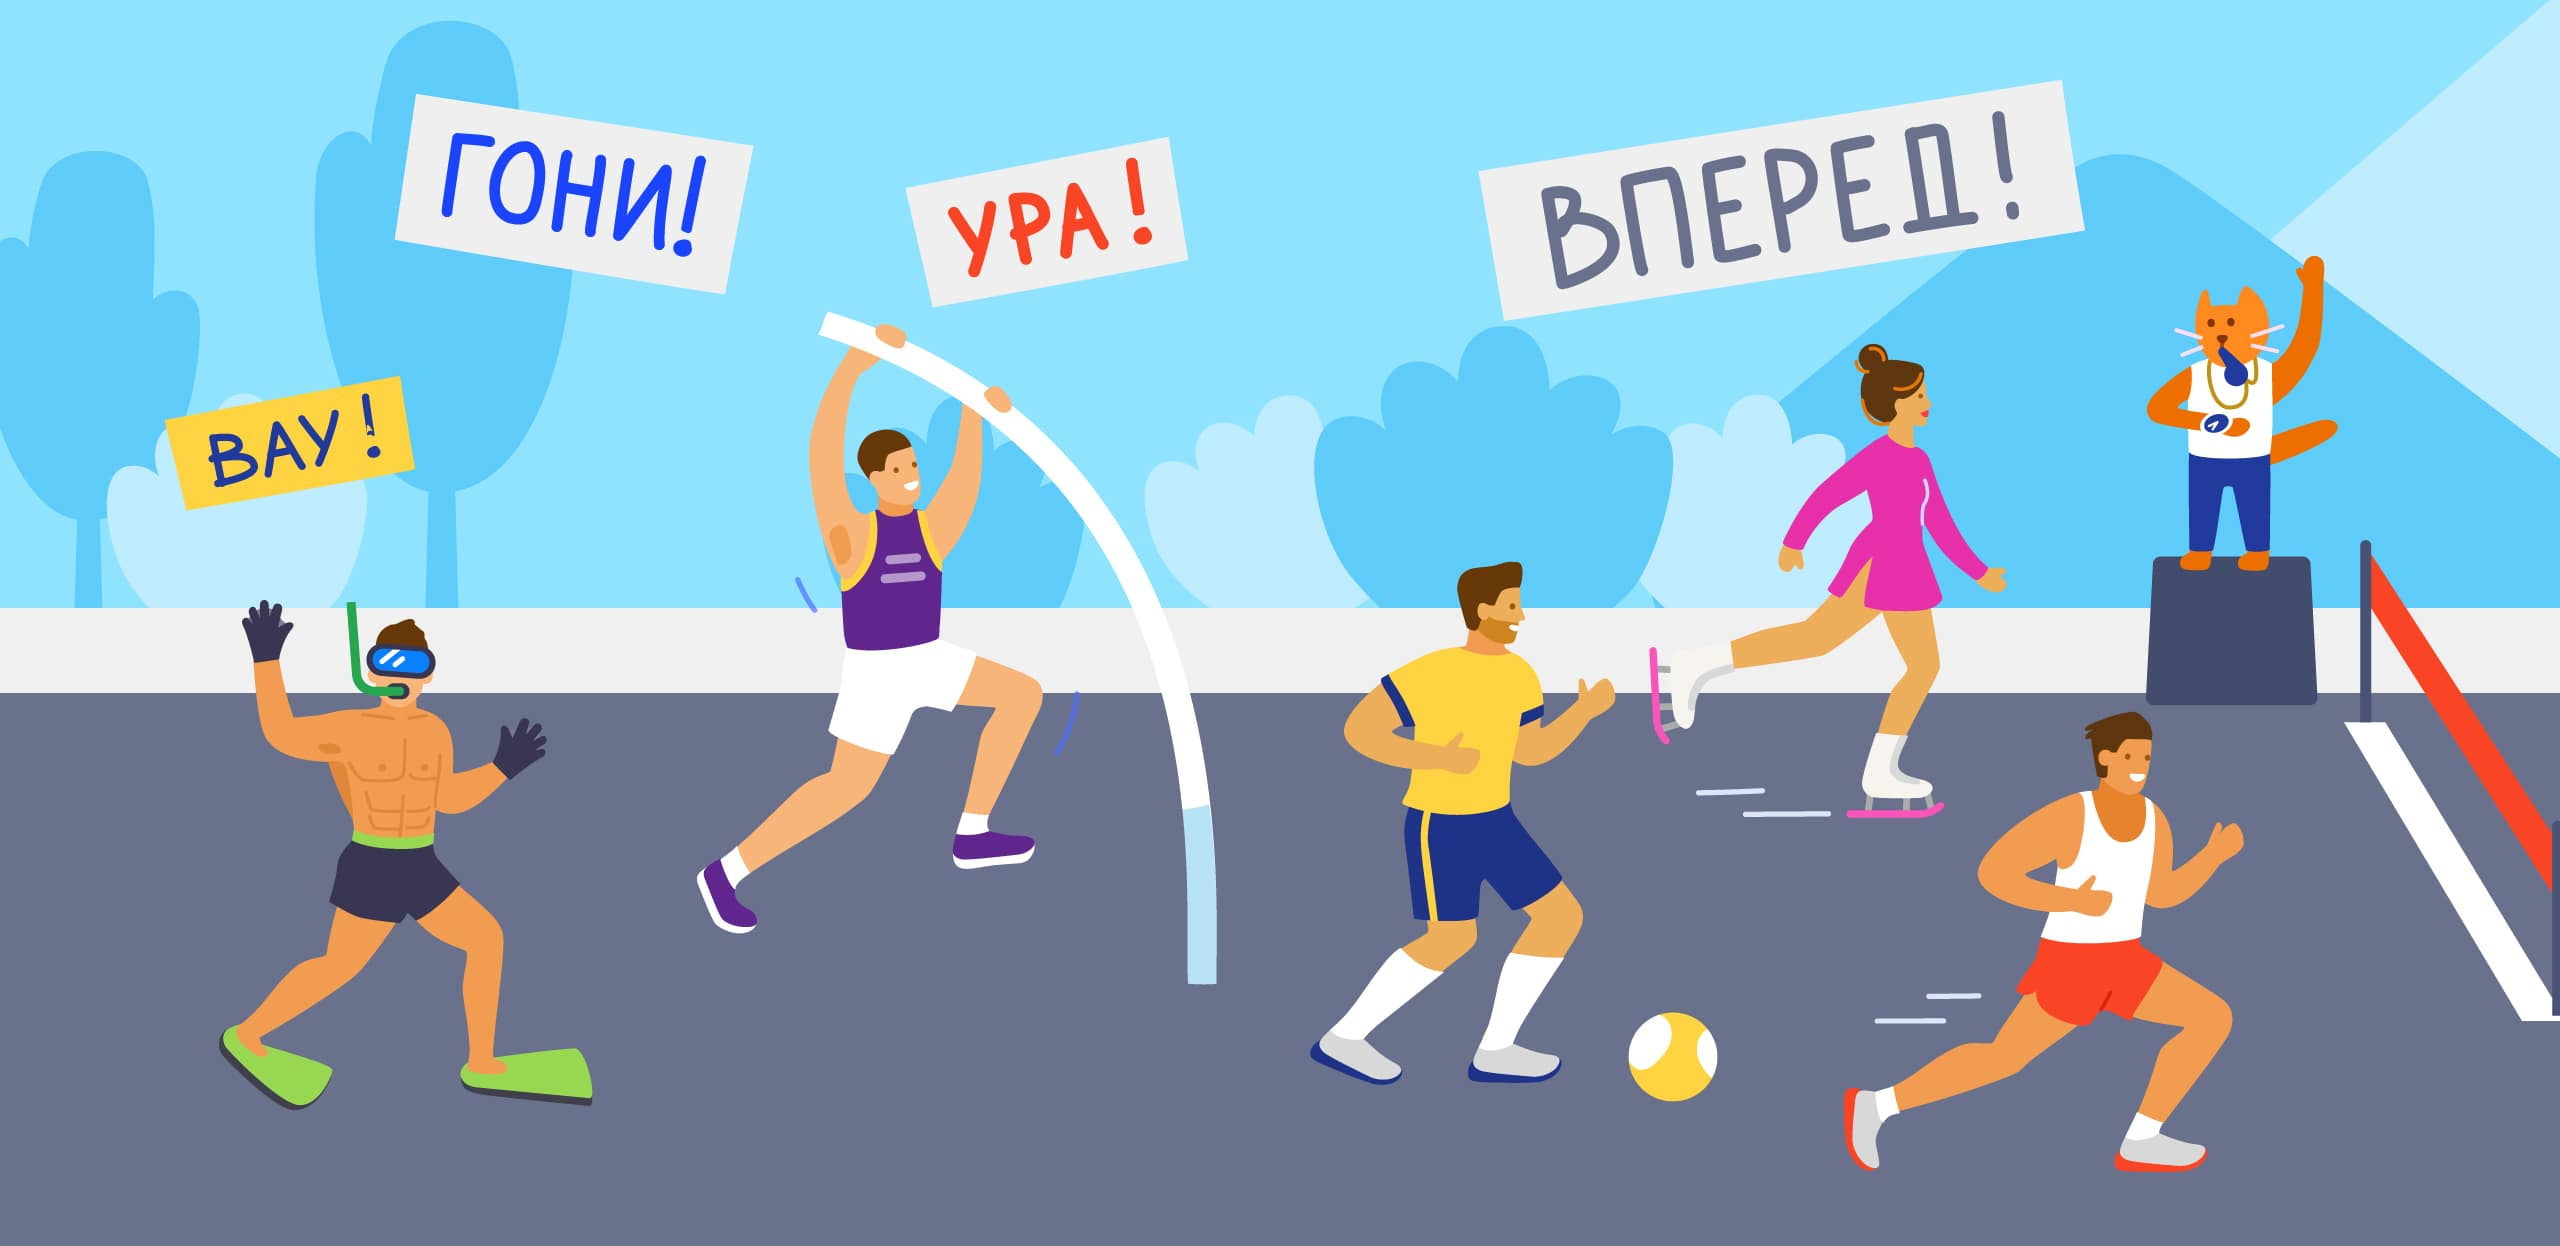 В ОК появилась лента новостей и рамки на фото от Олимпийского комитета России к старту Игр в Токио